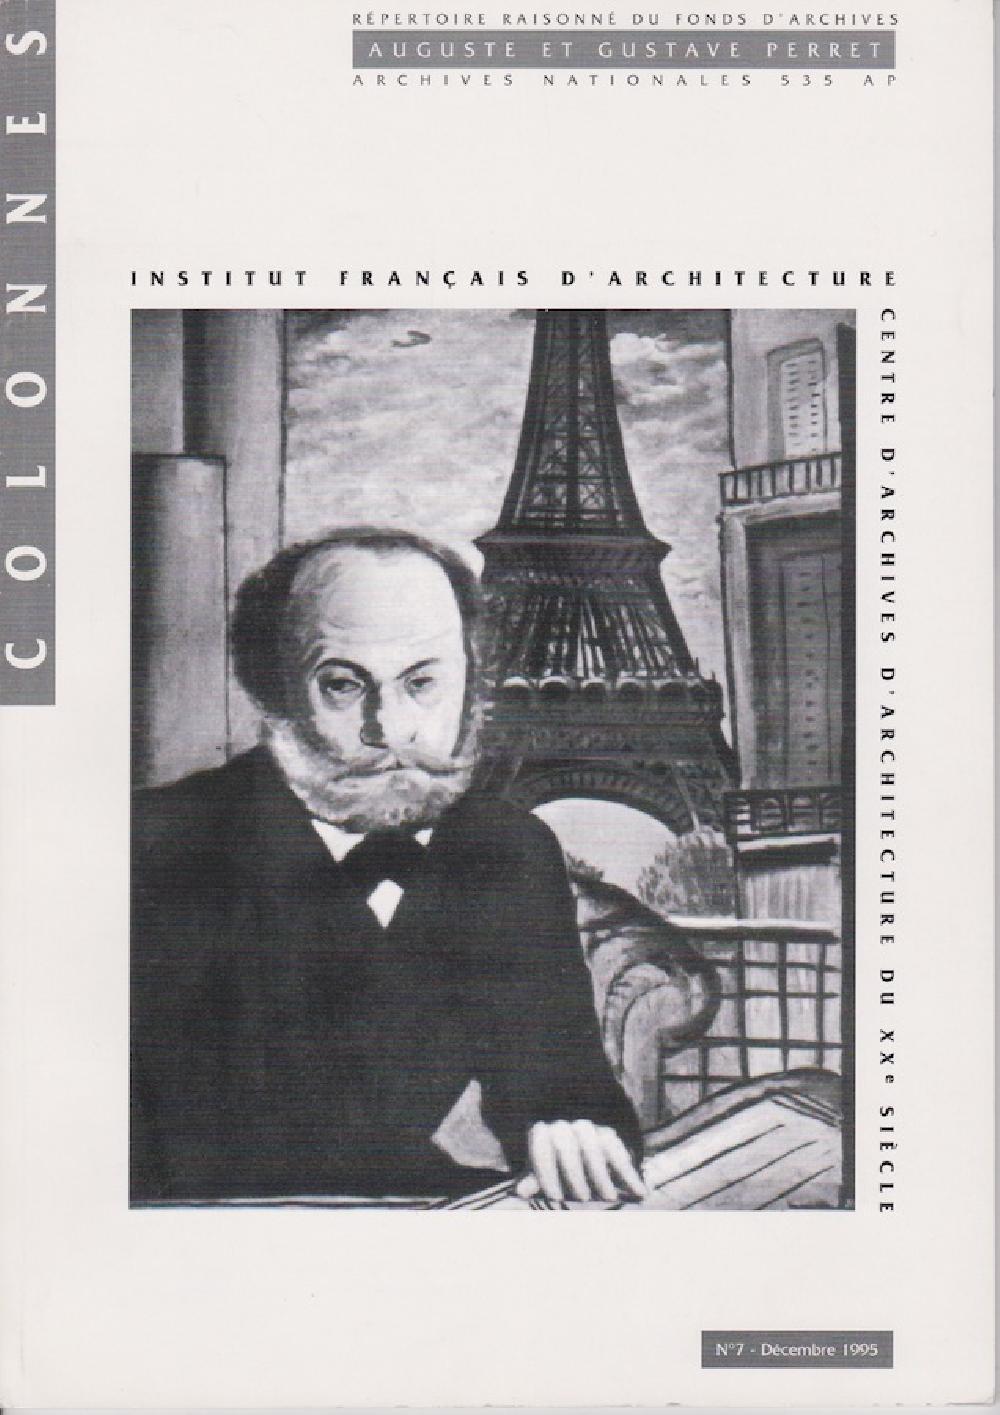 Colonnes n°7. Auguste Gustave Perret